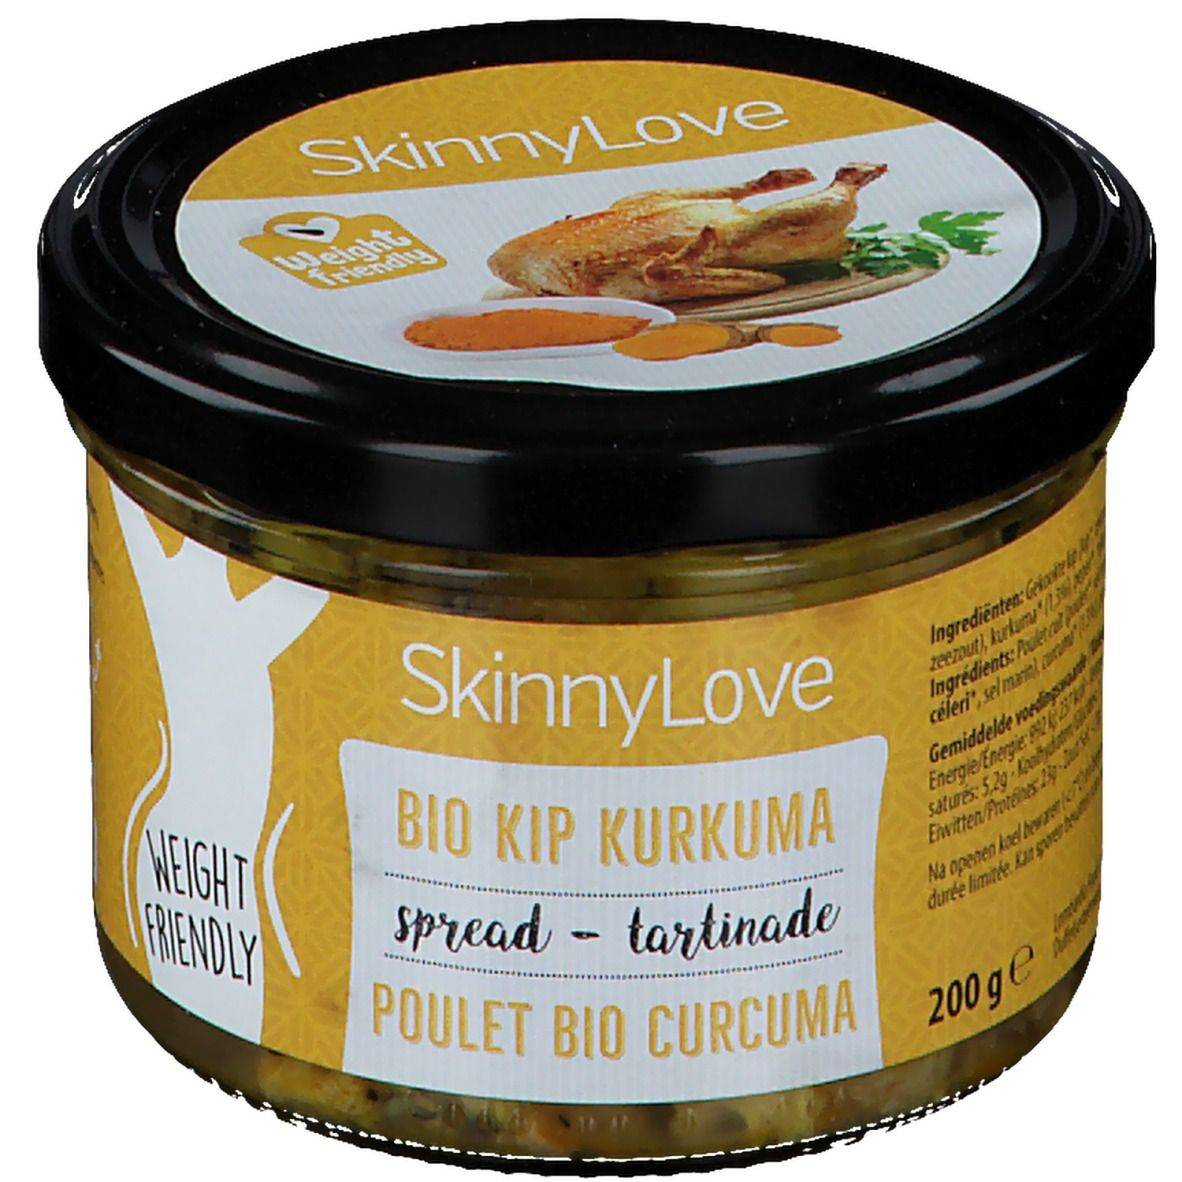 Skinny Love SkinnyLove Tartinade Poulet Curcuma Bio g restant(s)